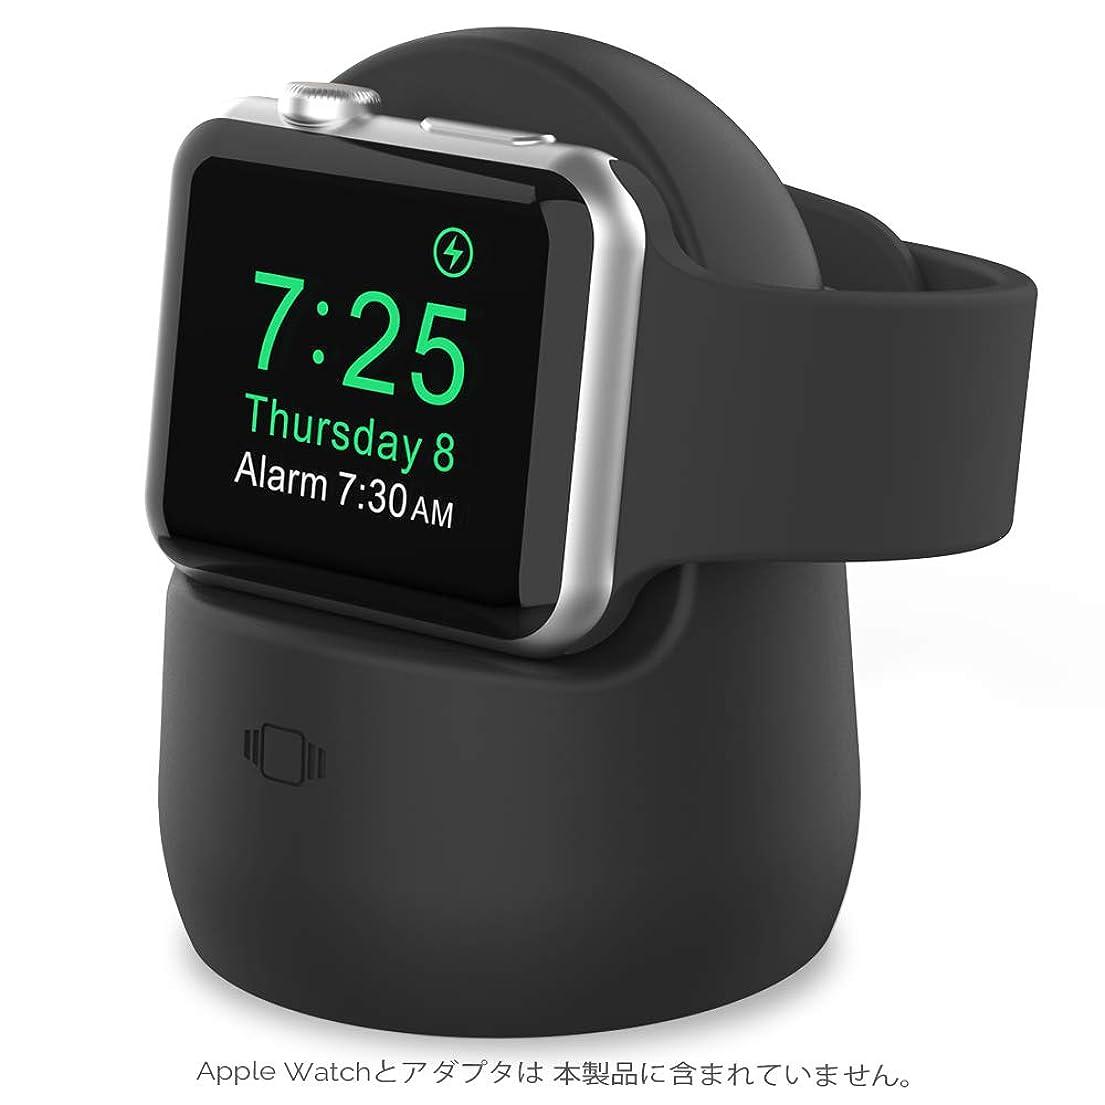 AhaStyle Apple Watch 充電スタンド Apple Watch Series 4 (2018)/Series 3/Series 2/ Series 1適用 アップルウォッチ シリコン スタンド 多機種対応 黒